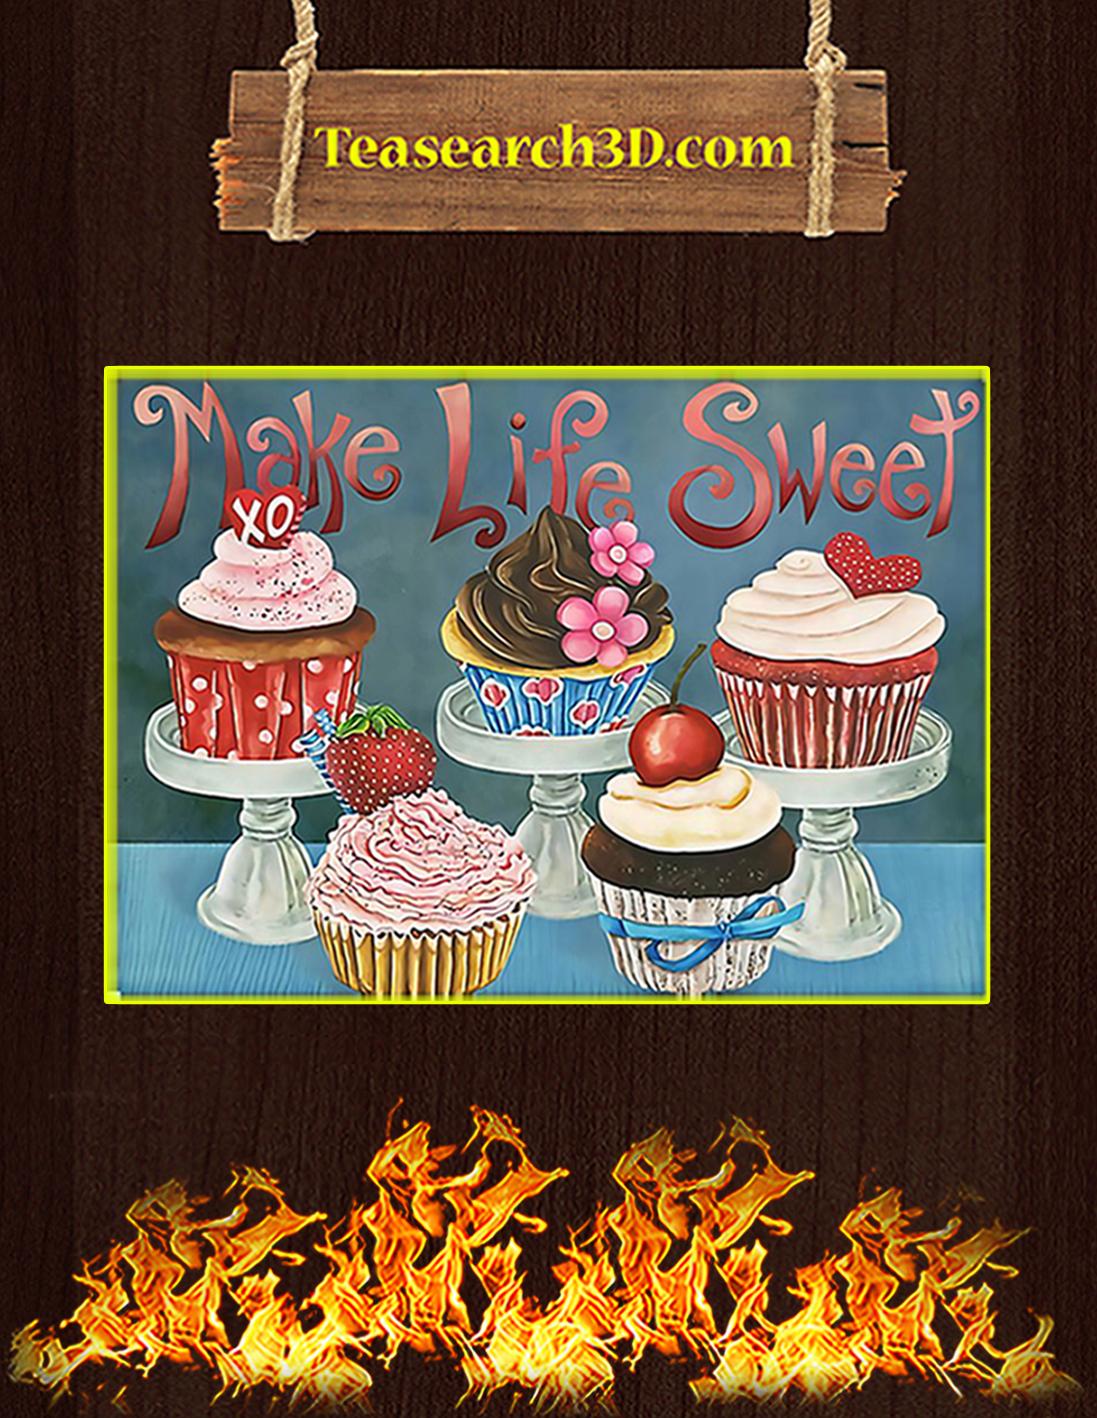 Baking make life sweet poster A2